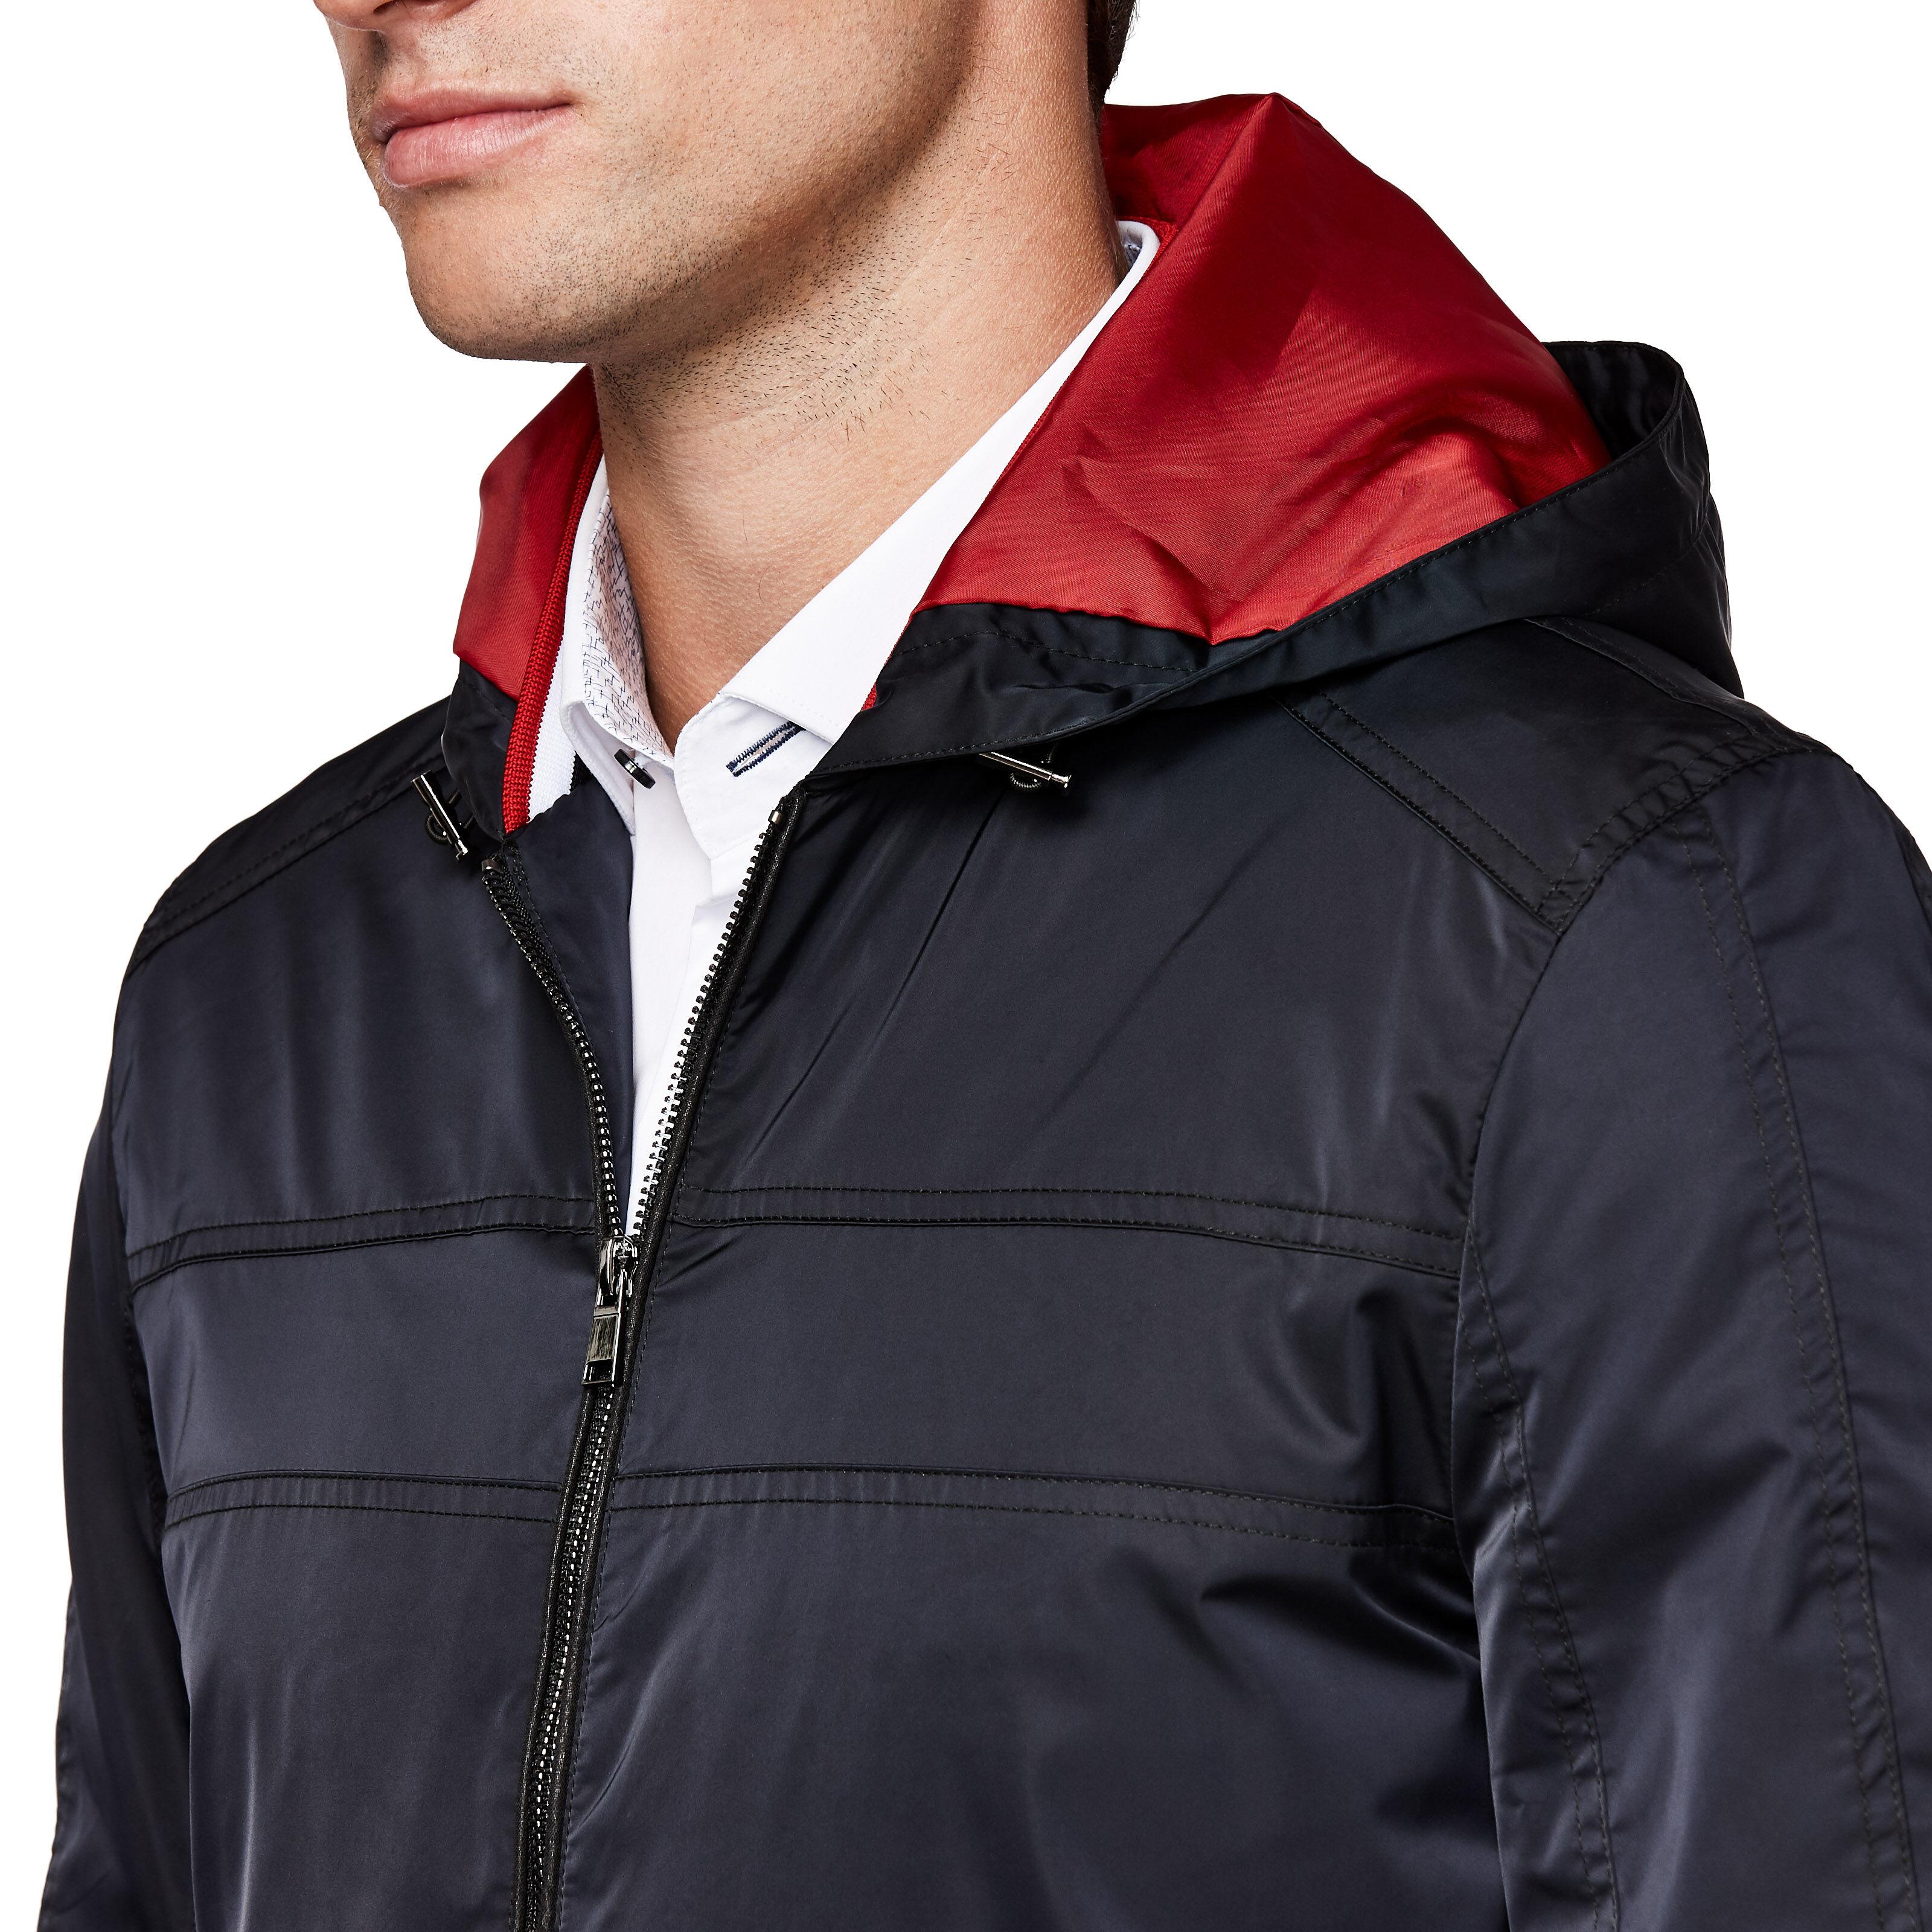 Kleidung & Accessoires Smart Rock 50 Crease-Resistance